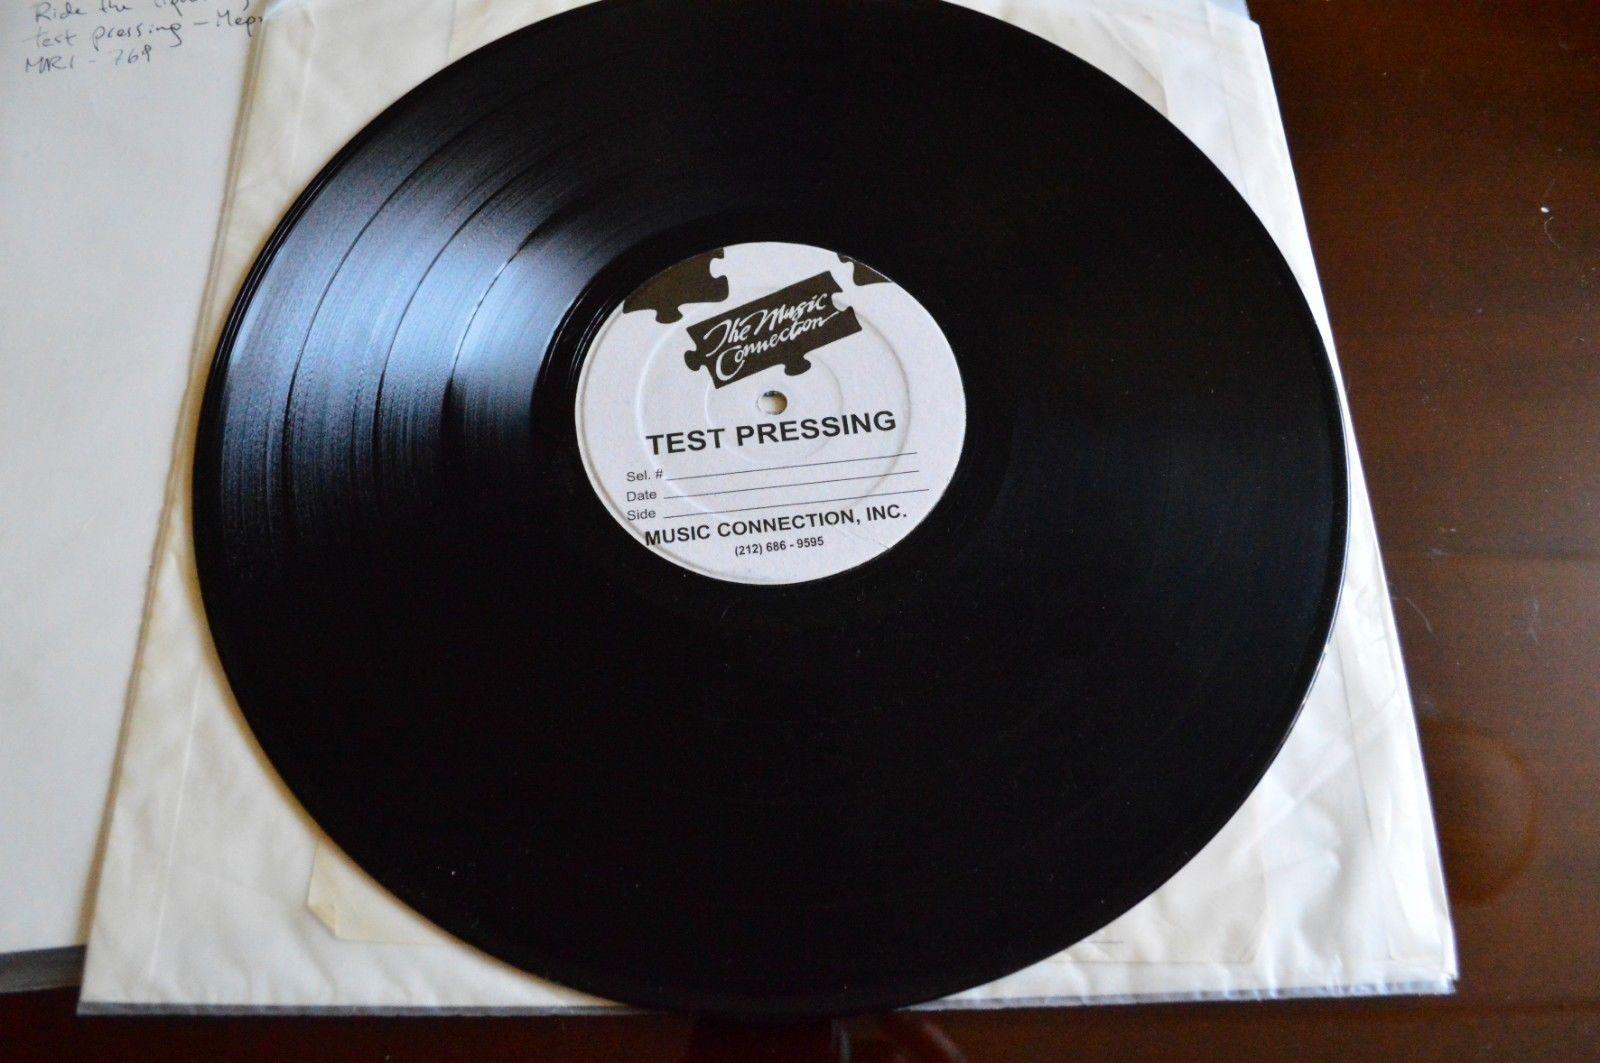 Metallica ride the lightning LP 1984 Test pressing megaforce slayer sodom